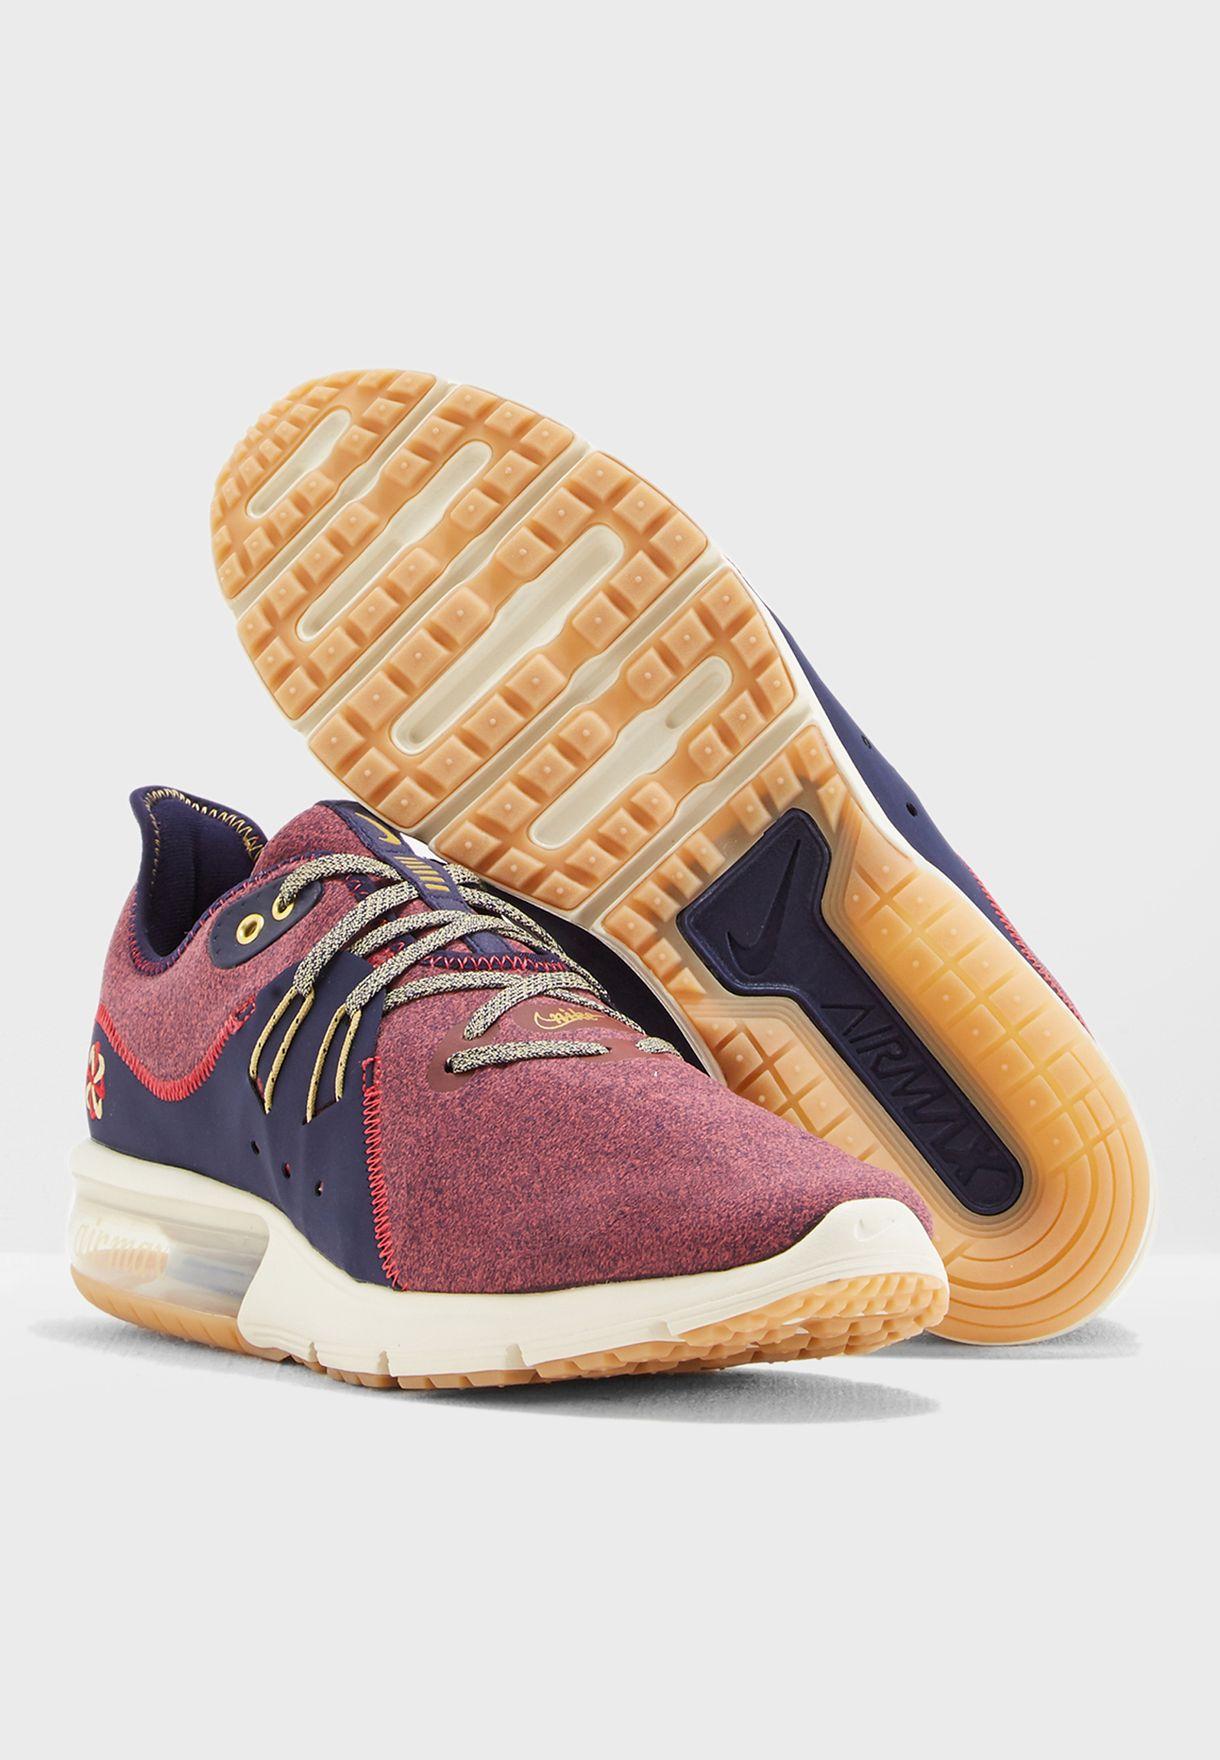 ea3e709d57 Shop Nike multicolor Air Max Sequent 3 PRM VST AR0253-600 for Men in ...